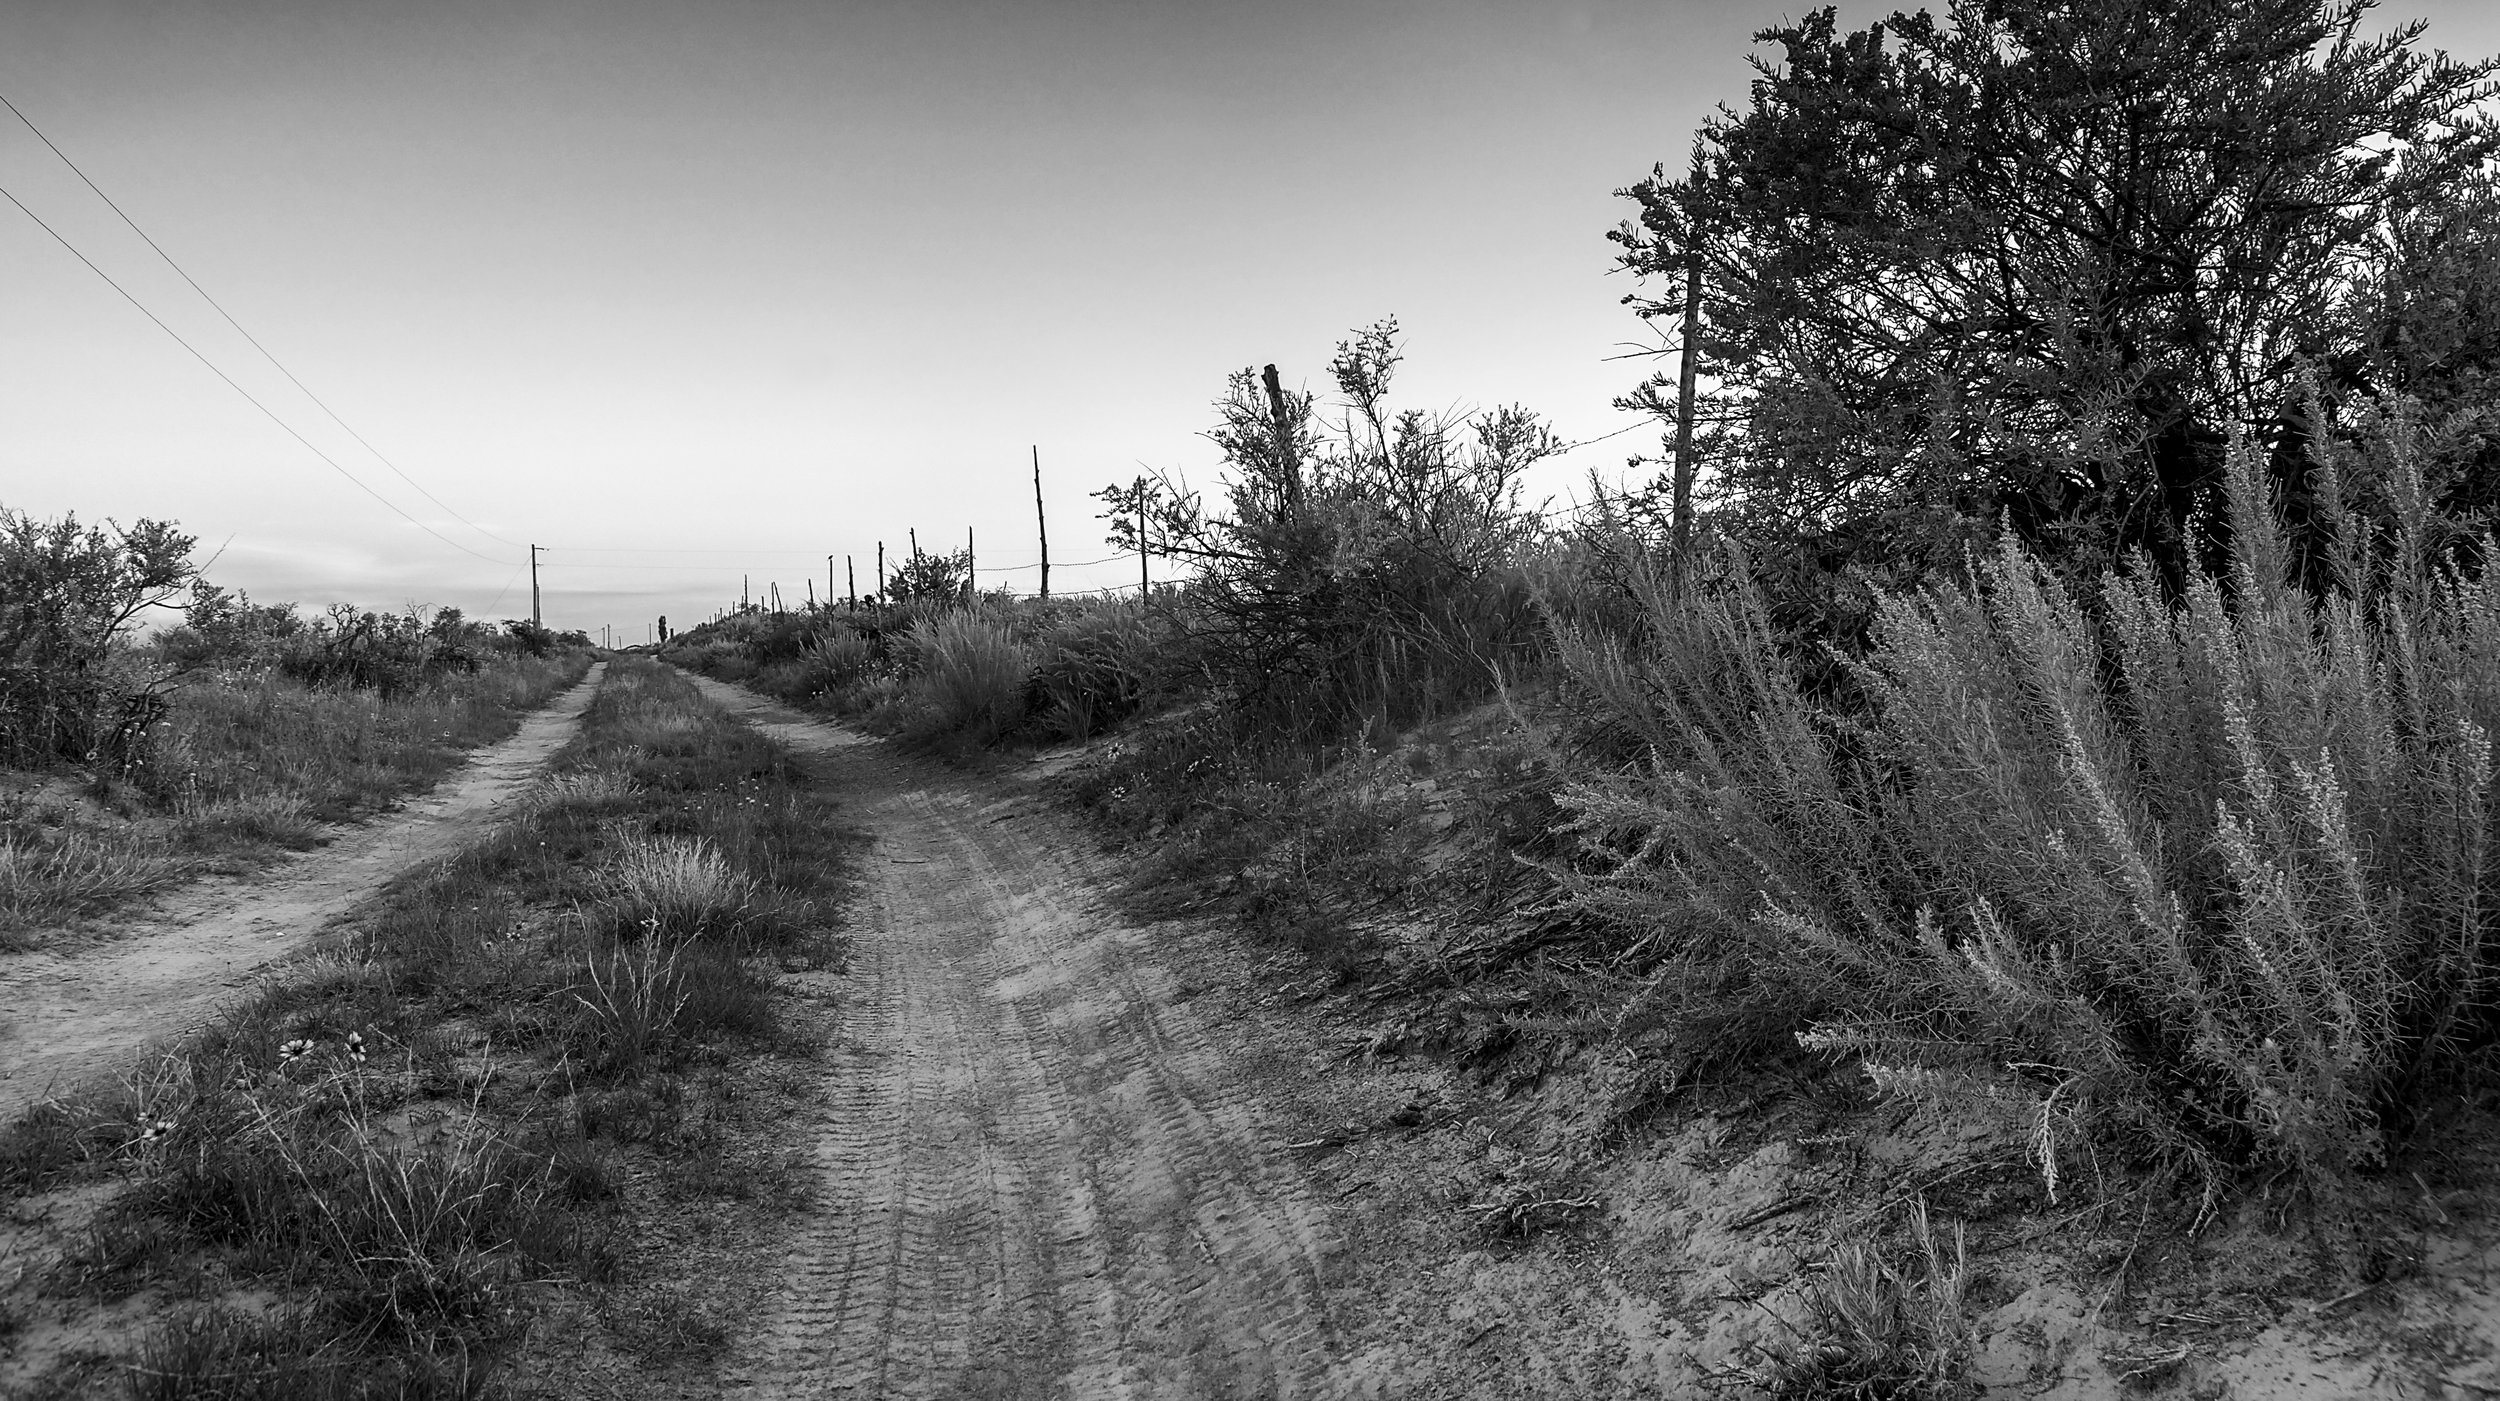 Black White Very Rural Road